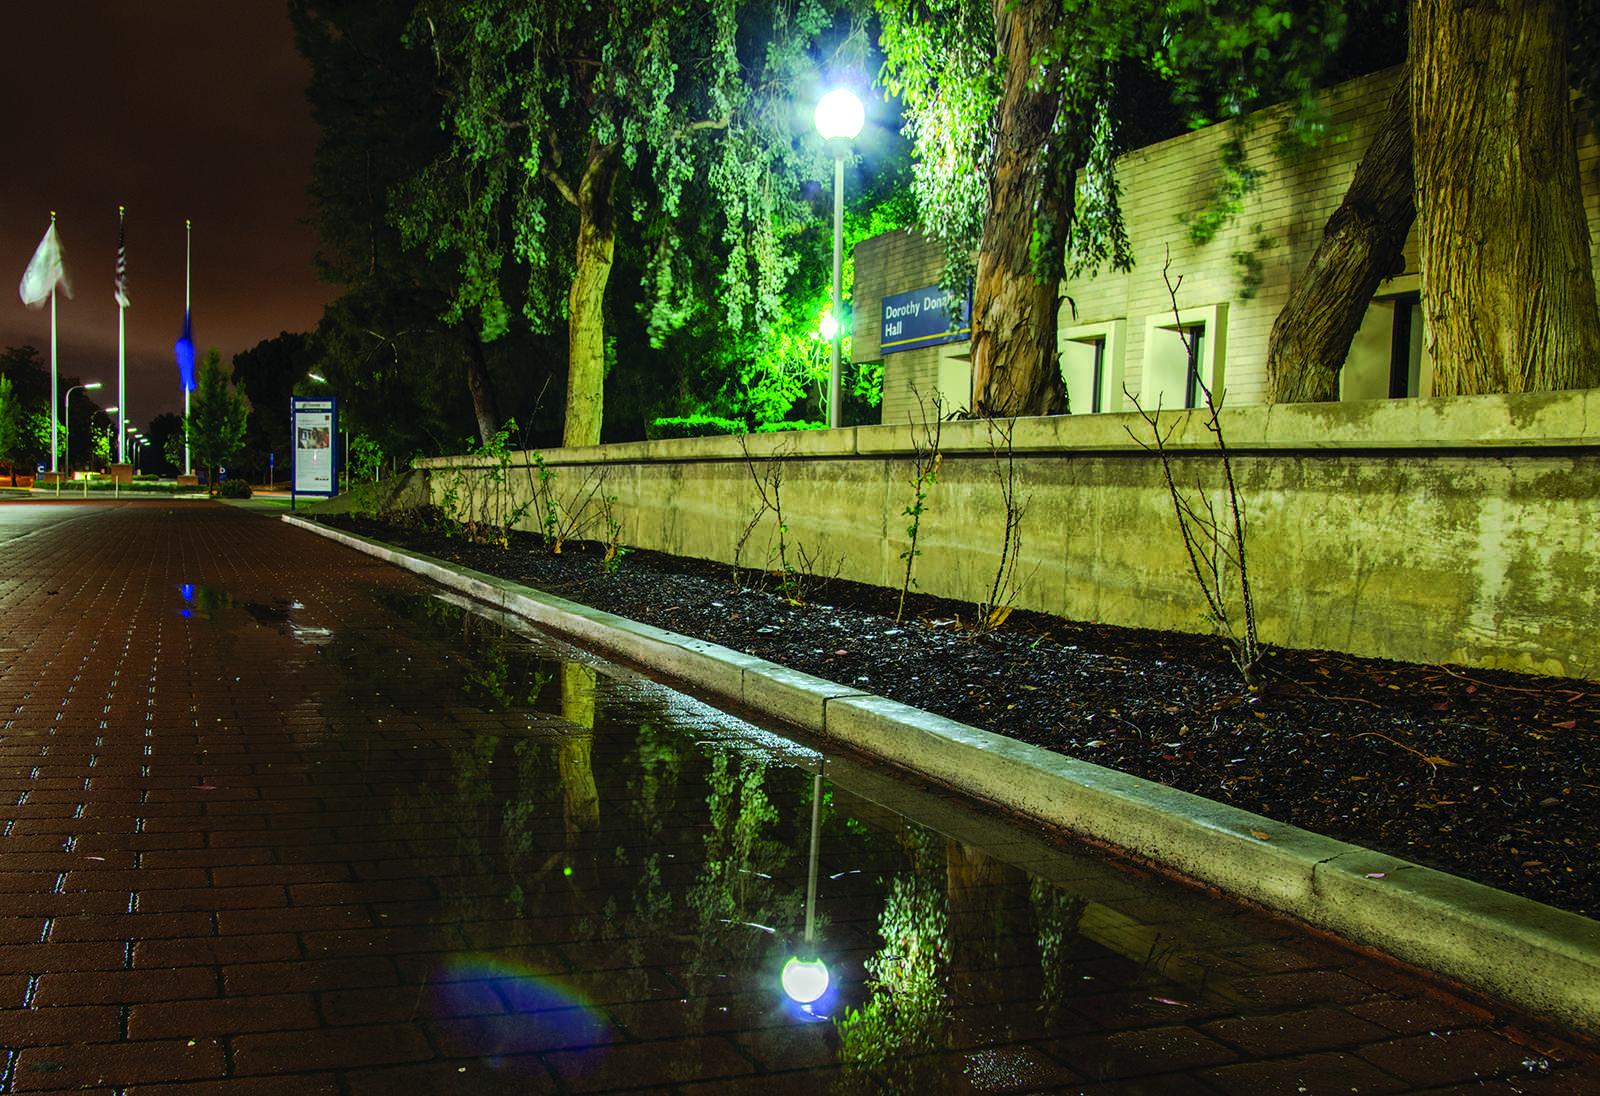 April showers form puddles on CSUB roads